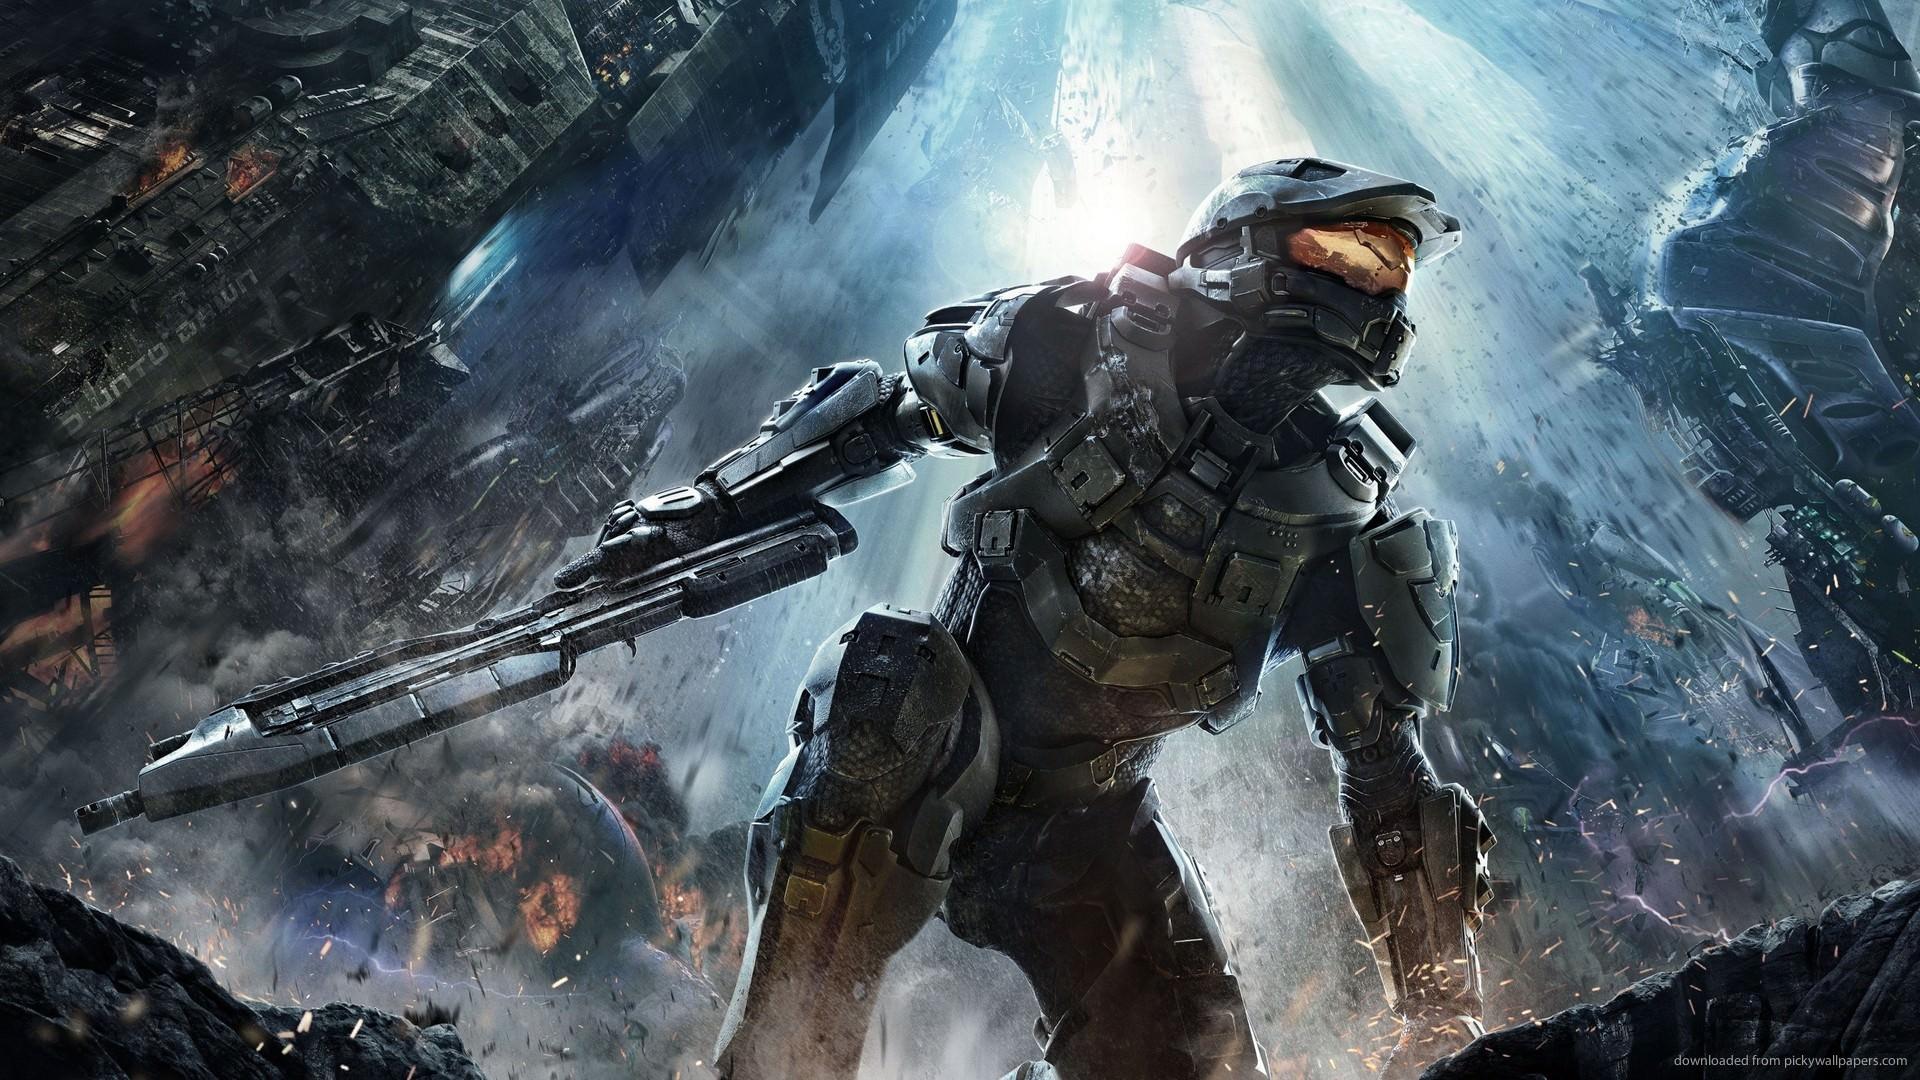 Halo 4 Cover Art Wallpaper